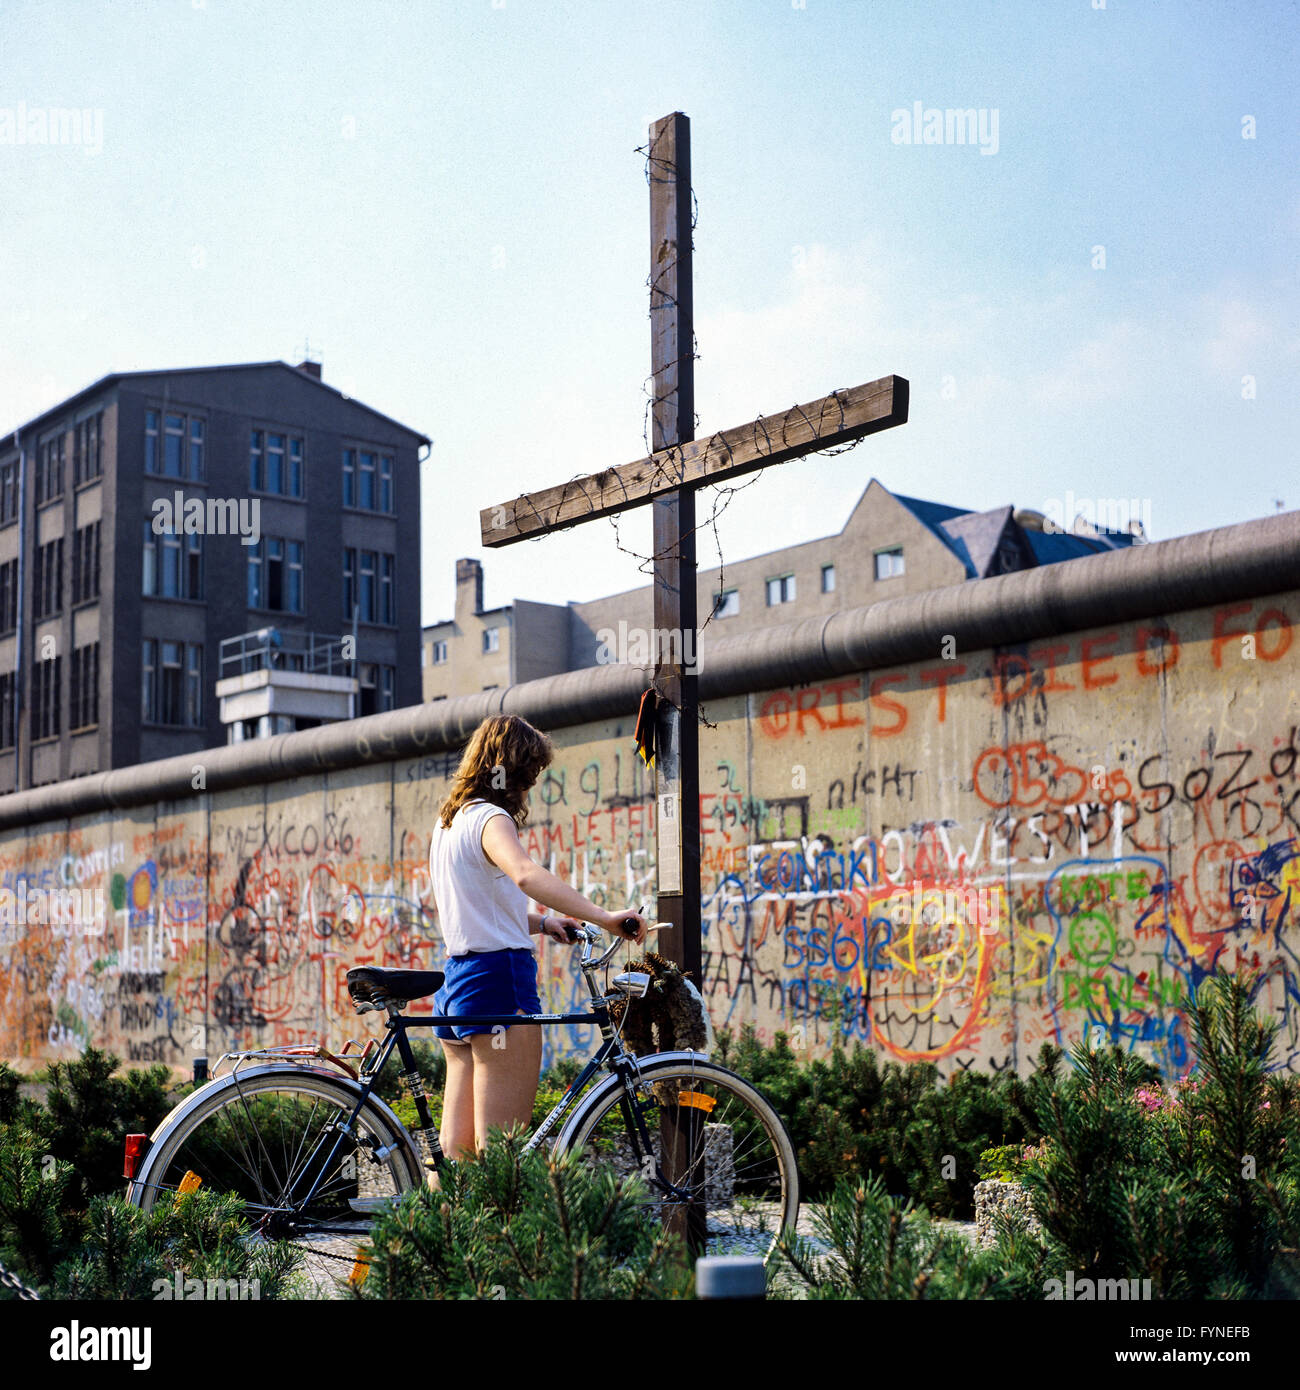 August 1986, young woman with bike, Peter Fechter memorial, graffitis on Berlin Wall, Zimmerstrasse street, Kreuzberg, - Stock Image